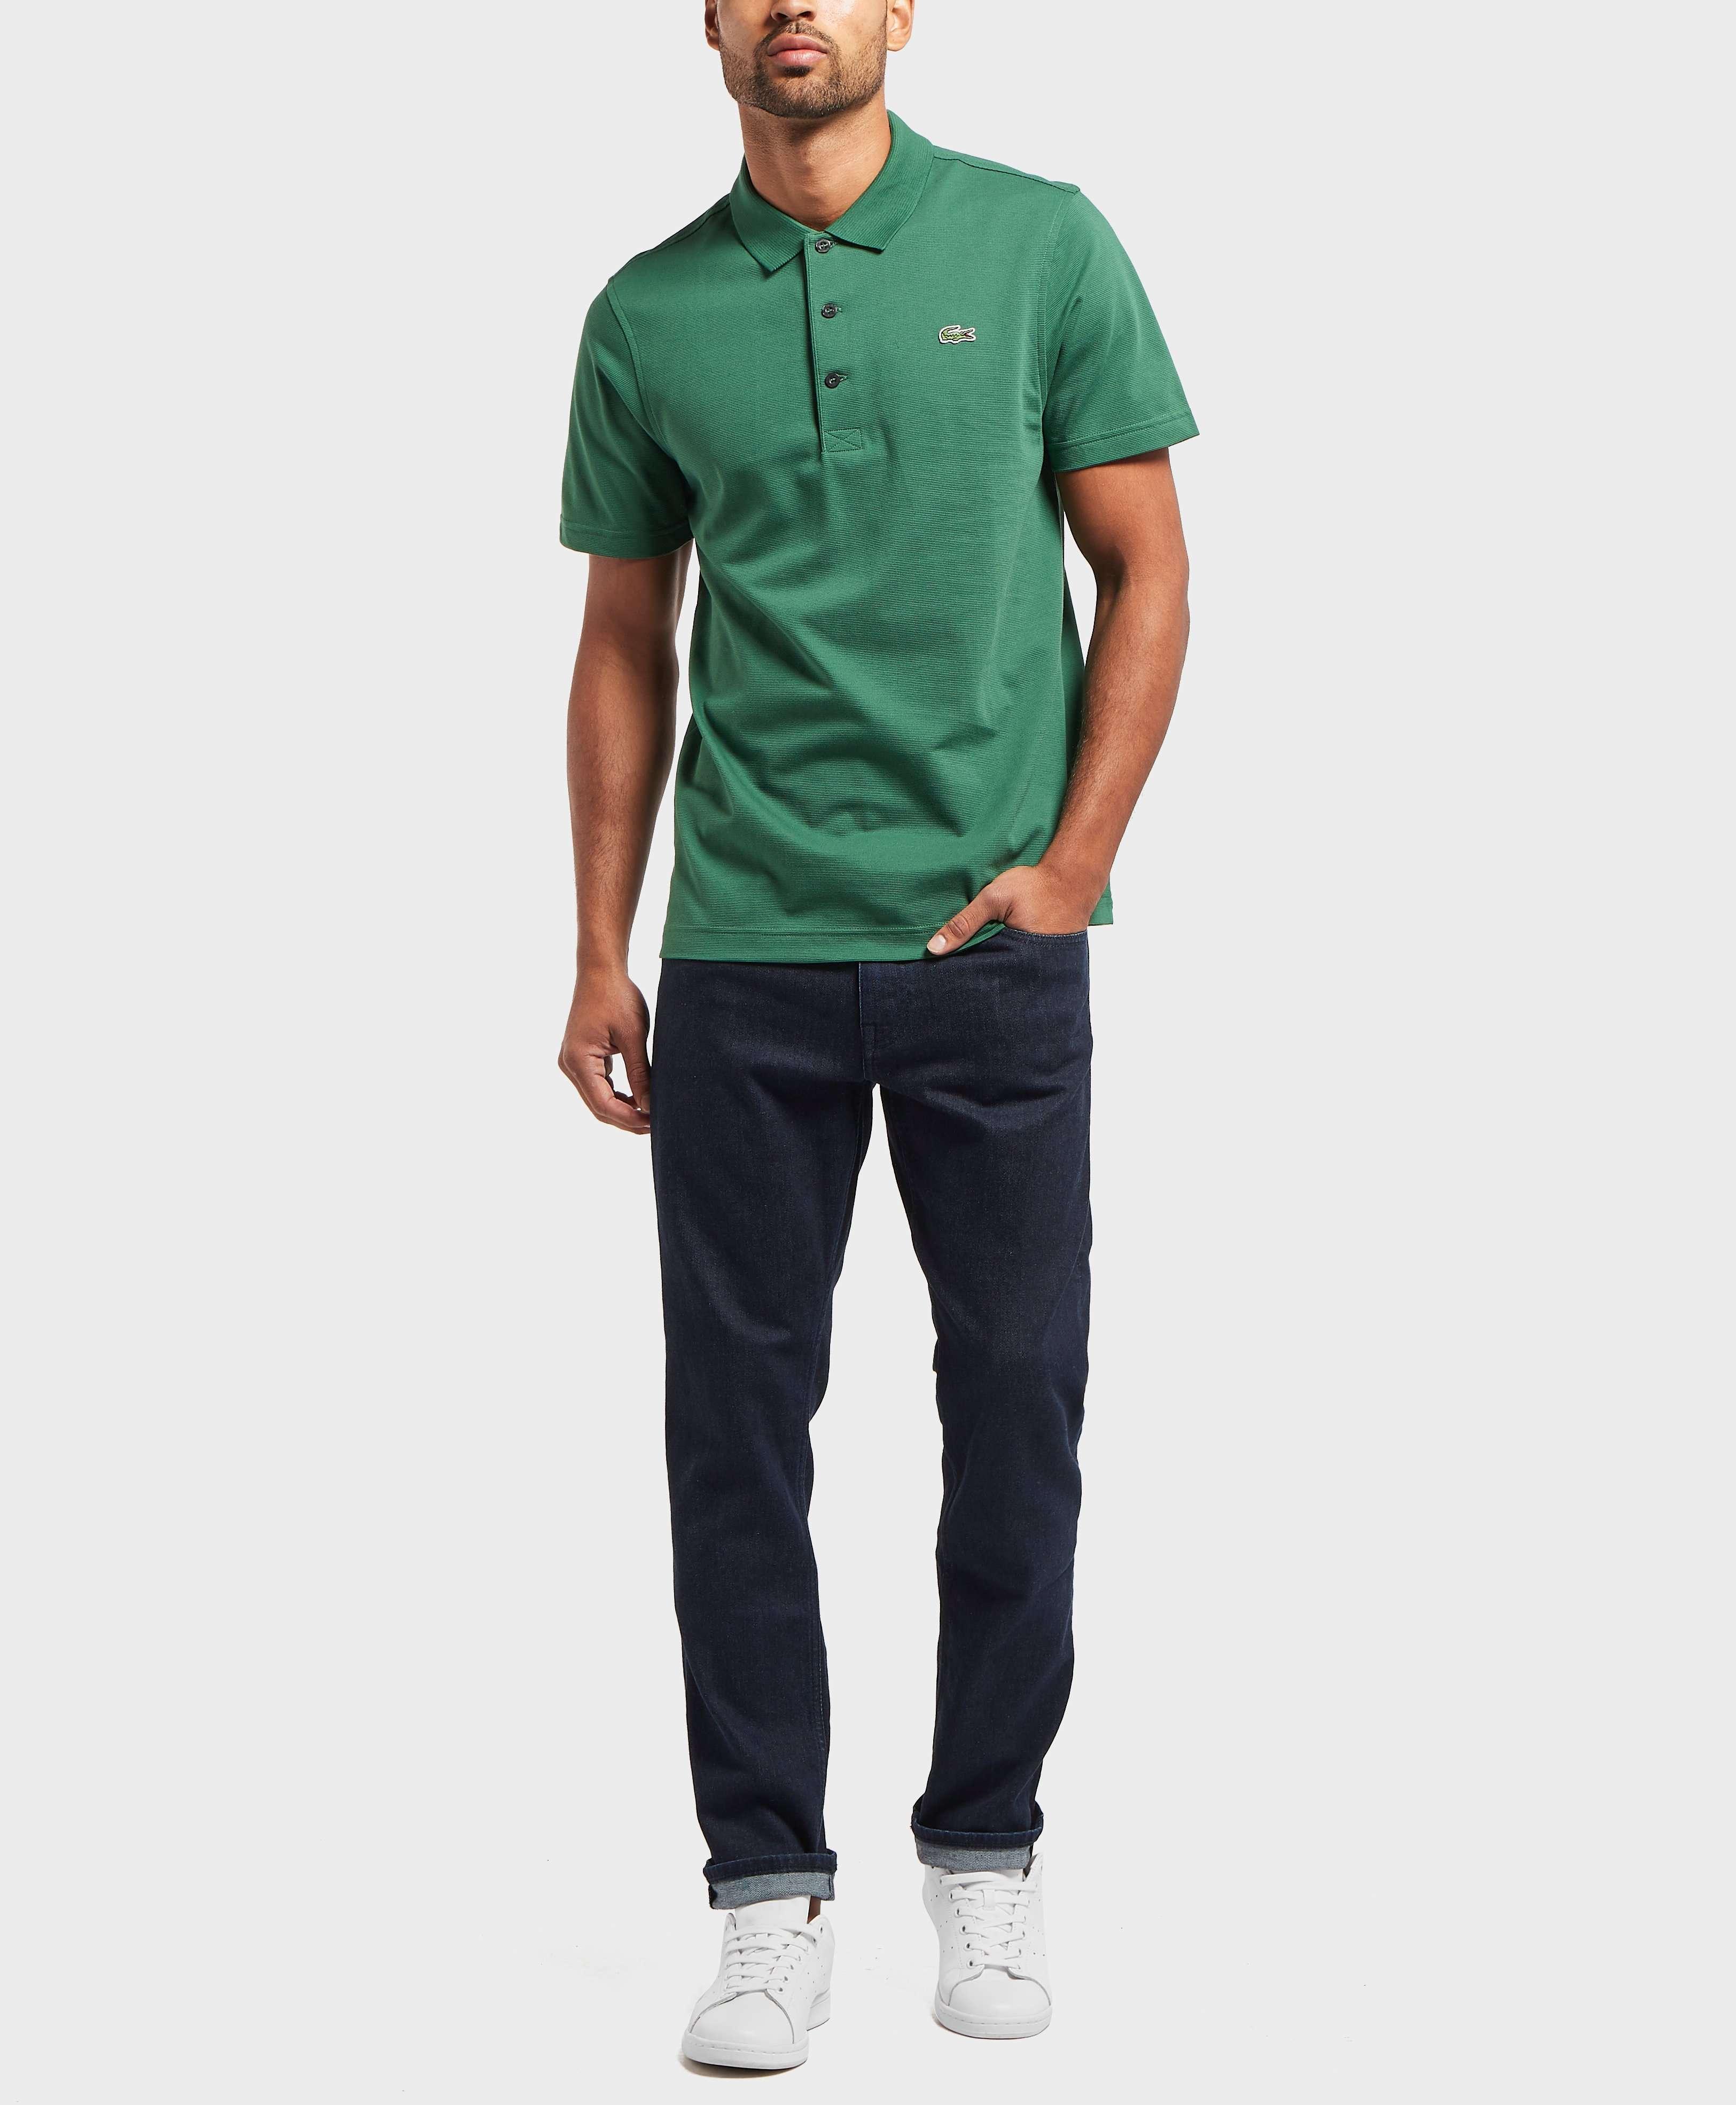 Lacoste Alligator Short Sleeve Polo Shirt